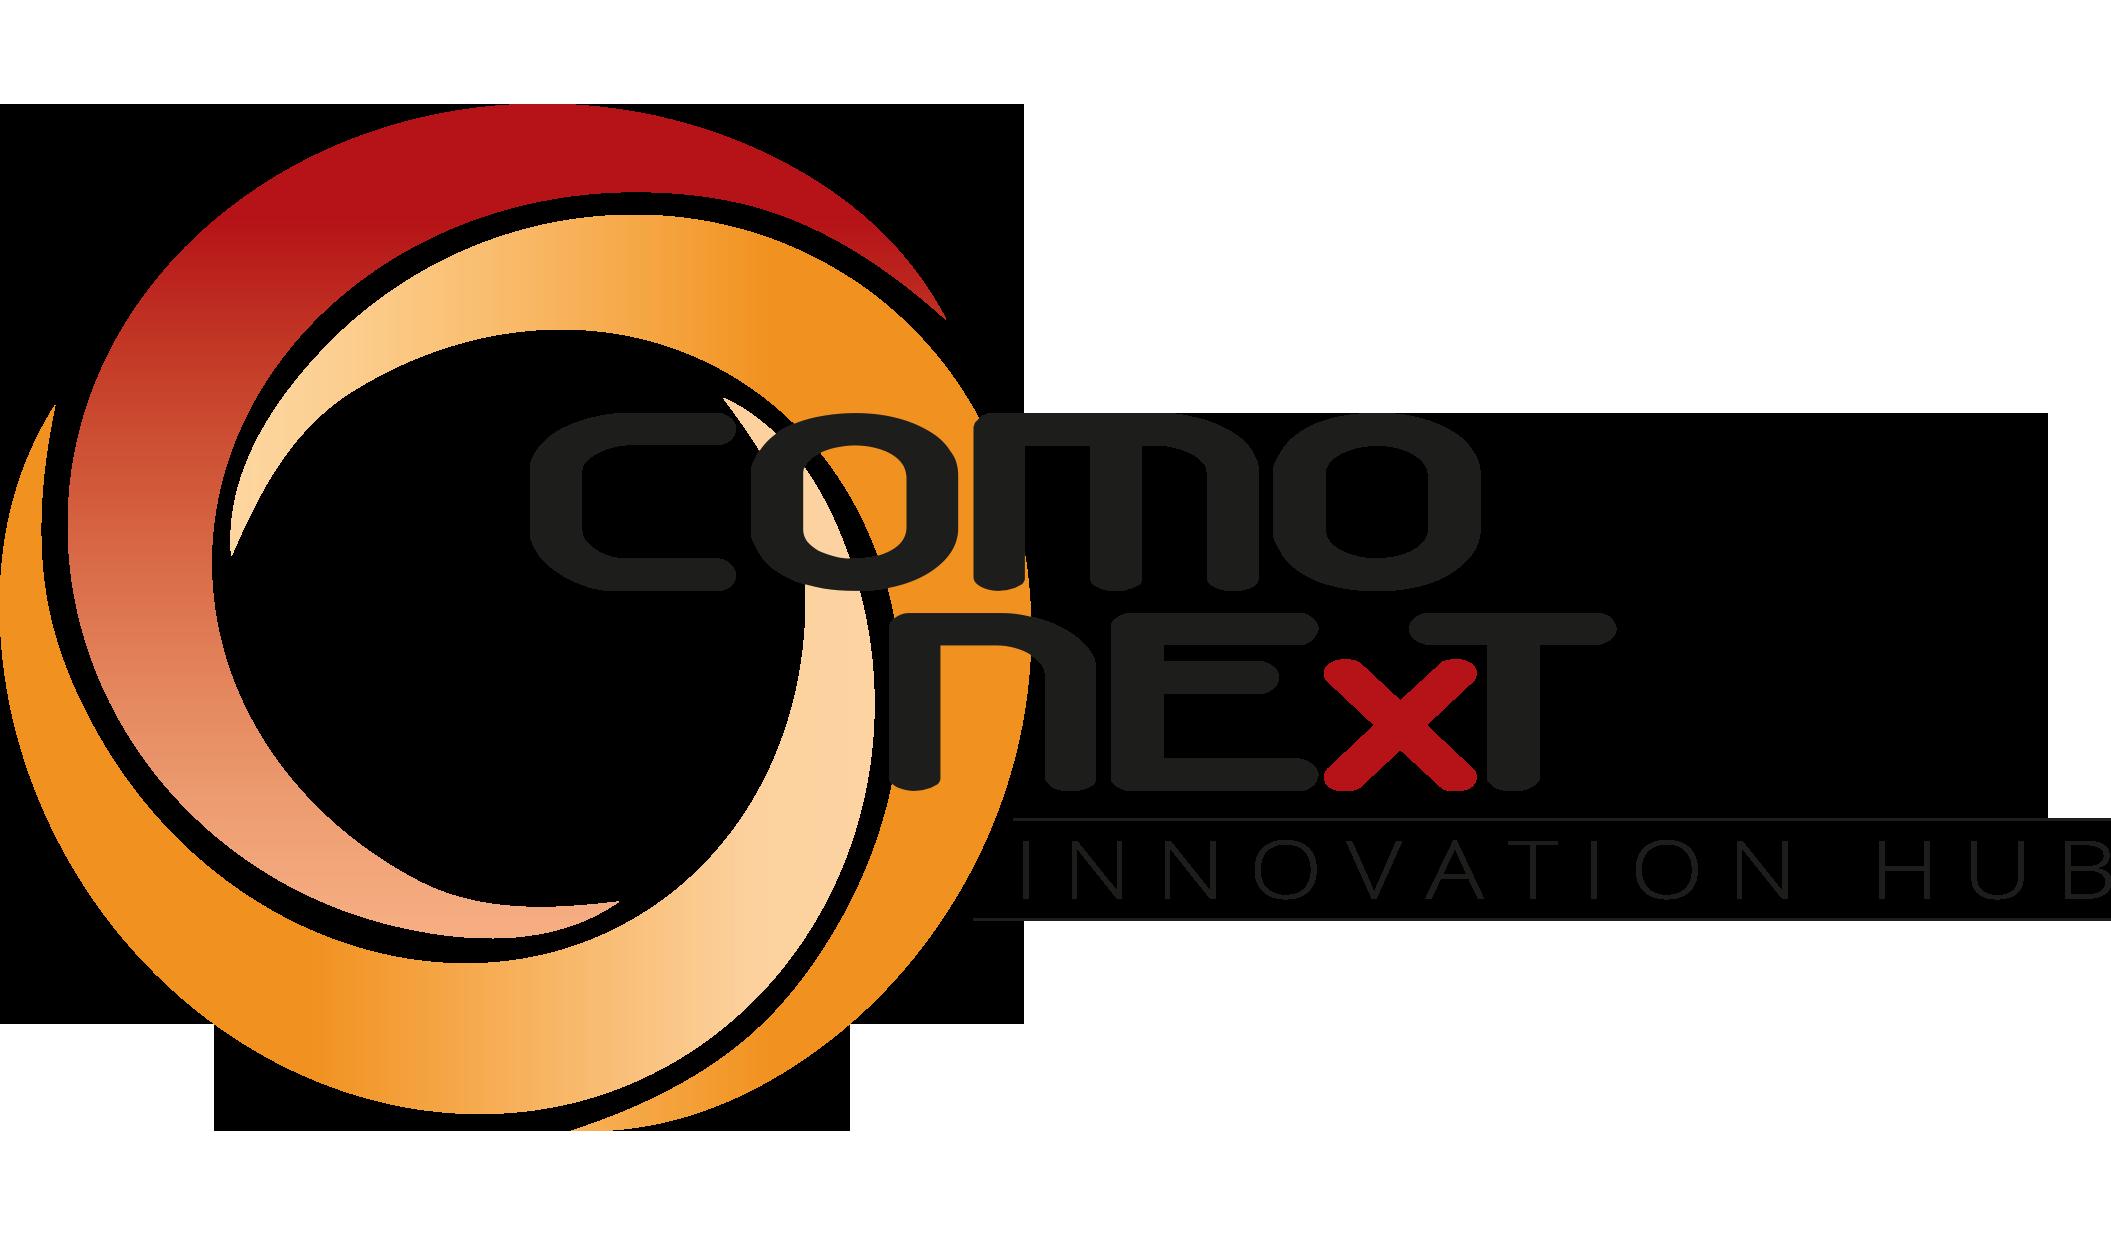 Sviluppo Como - ComoNExT SpA